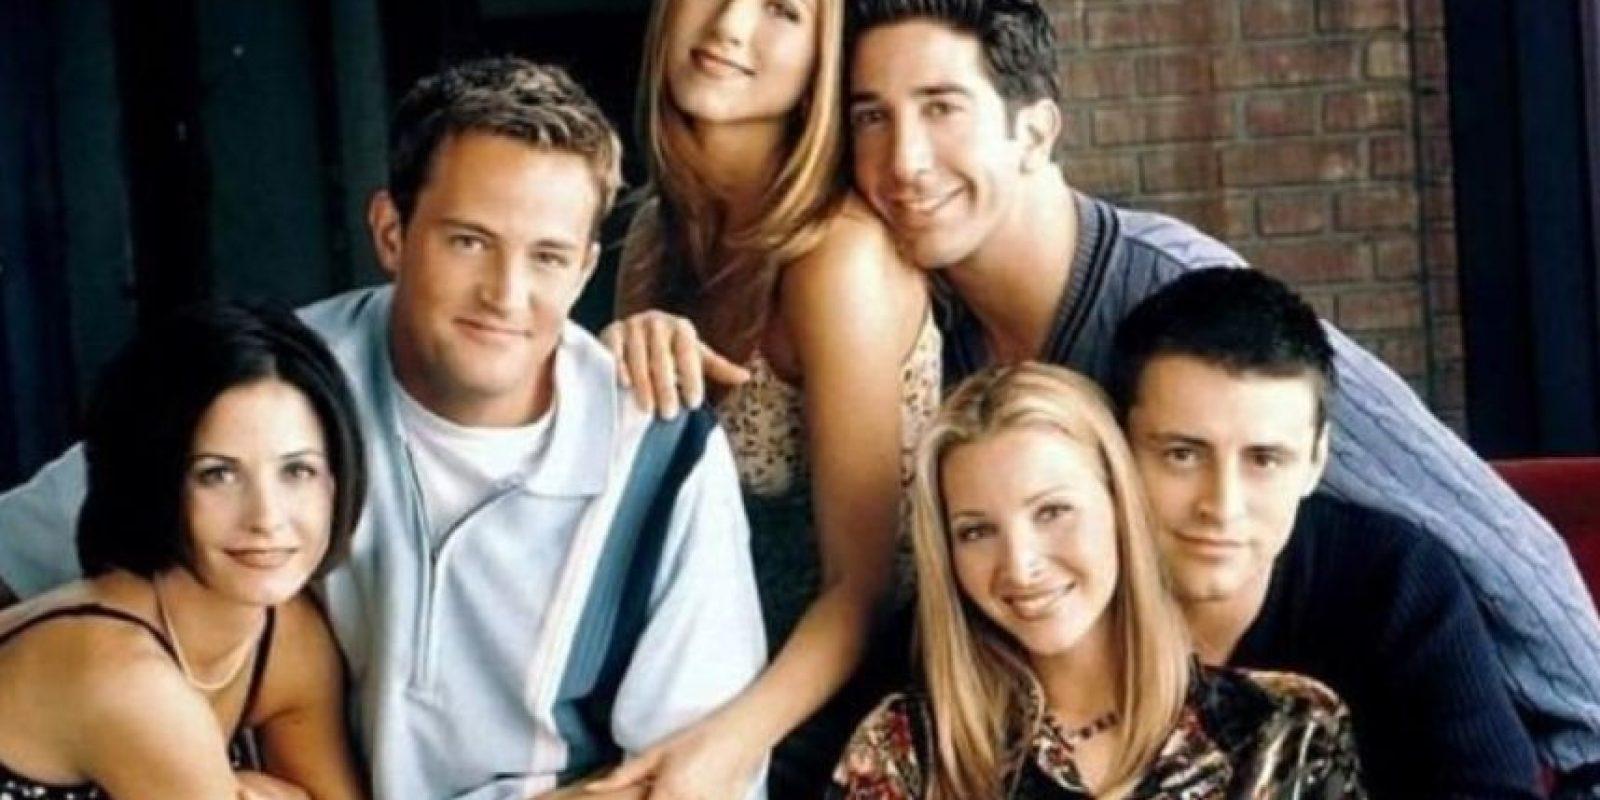 """Friends""Se emitió por primera vez el 22 de septiembre de 1994 por la cadena NBC. Foto:Vía Twitter/@HookedonFriends"